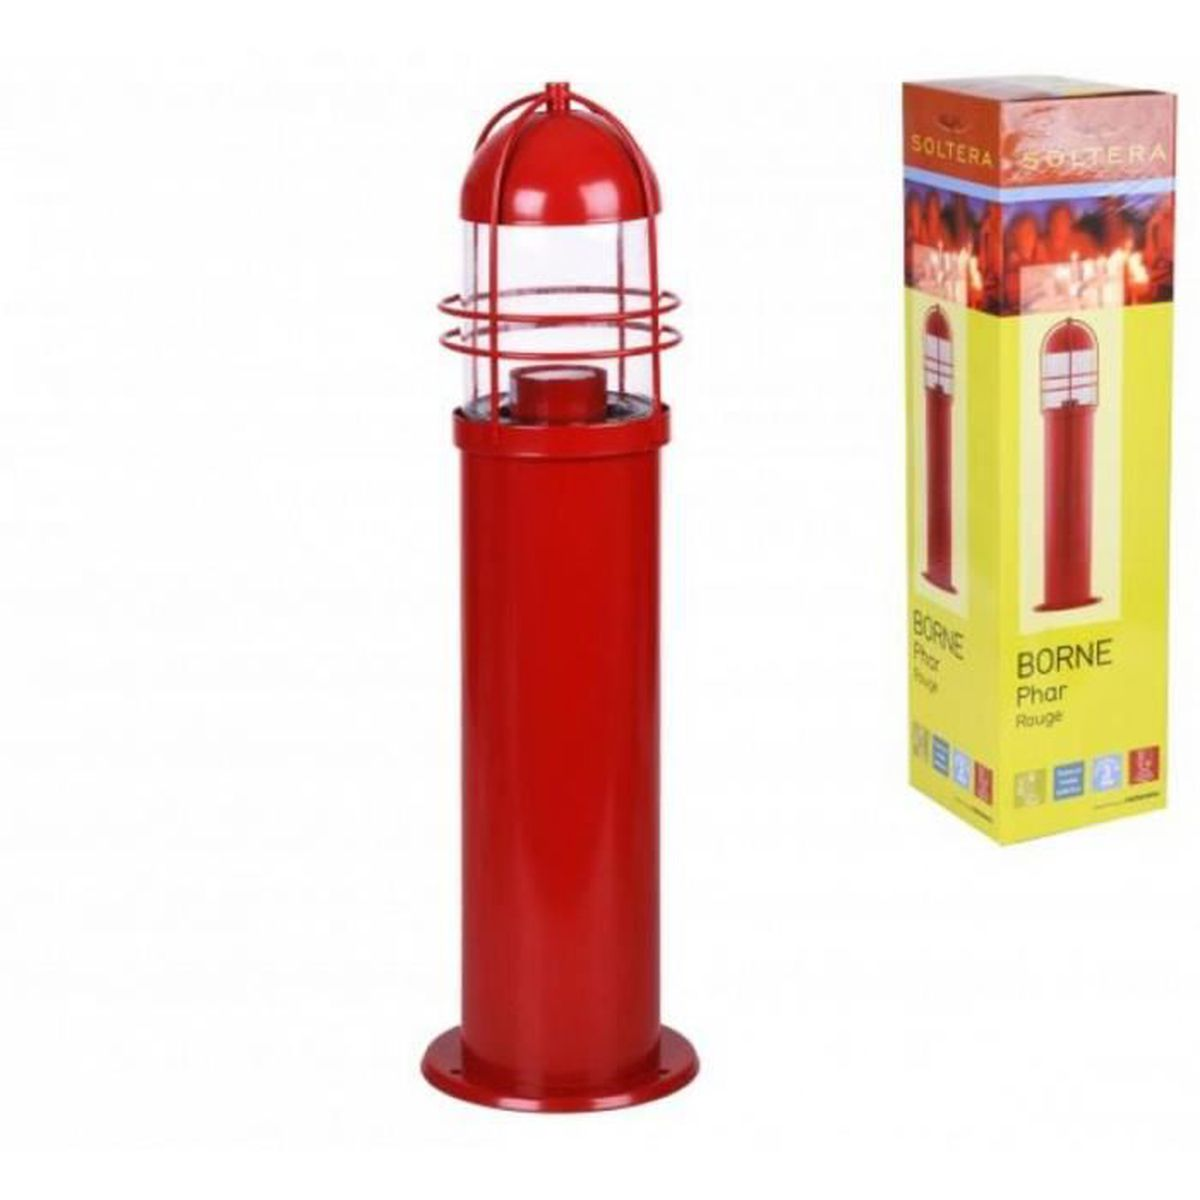 Borne de marine phare eclairage lampe de jardin electrique for Eclairage jardin led electrique